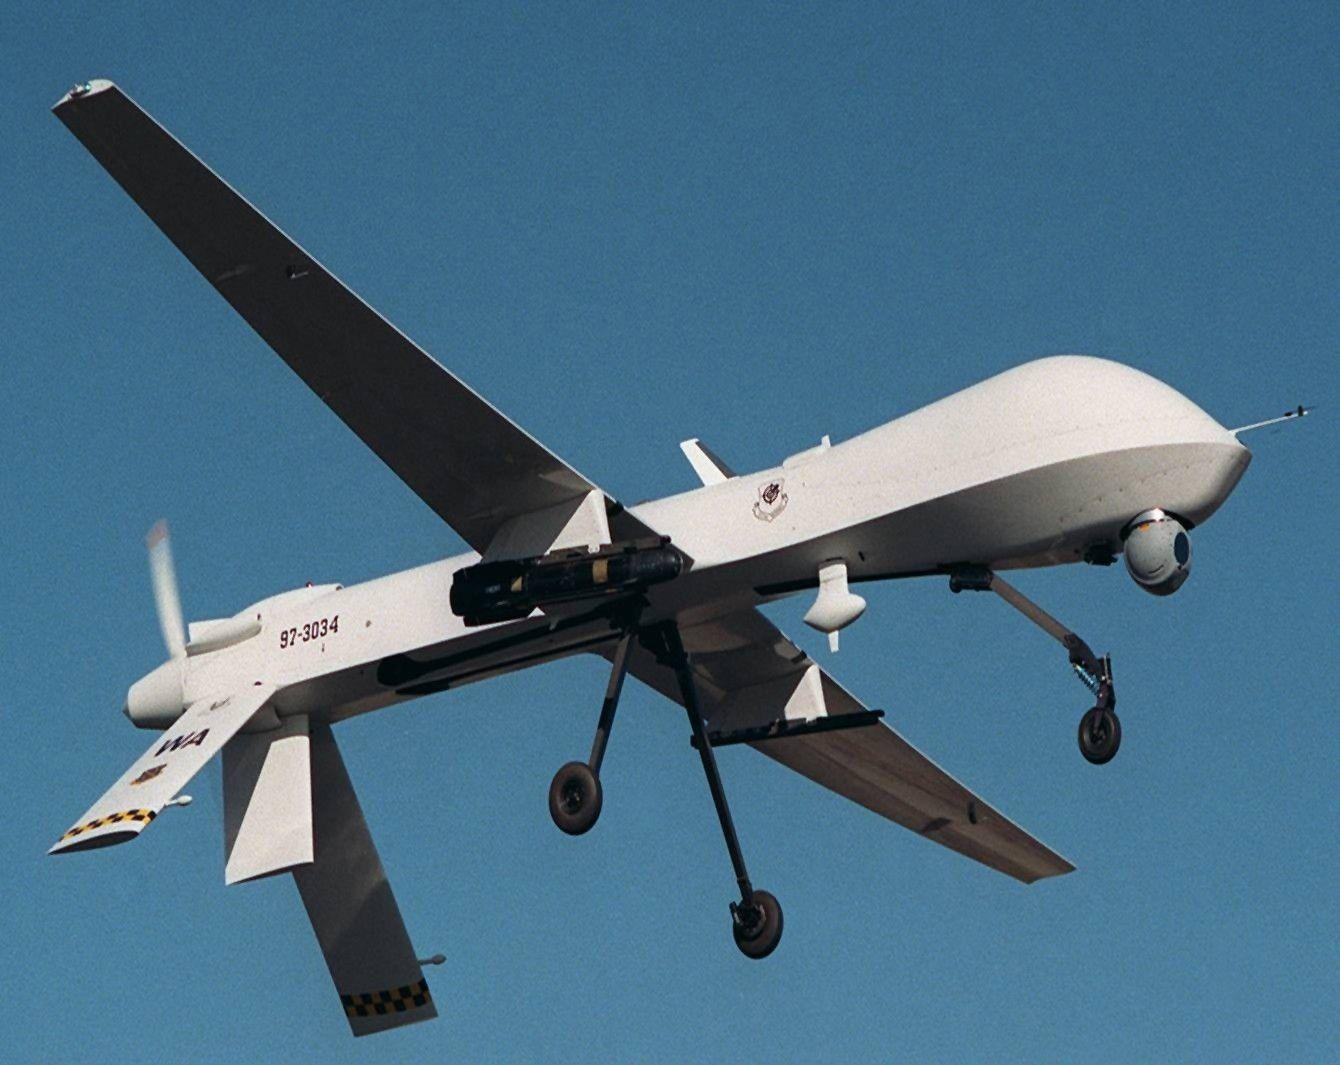 Anyone fly drones? - predator.JPG